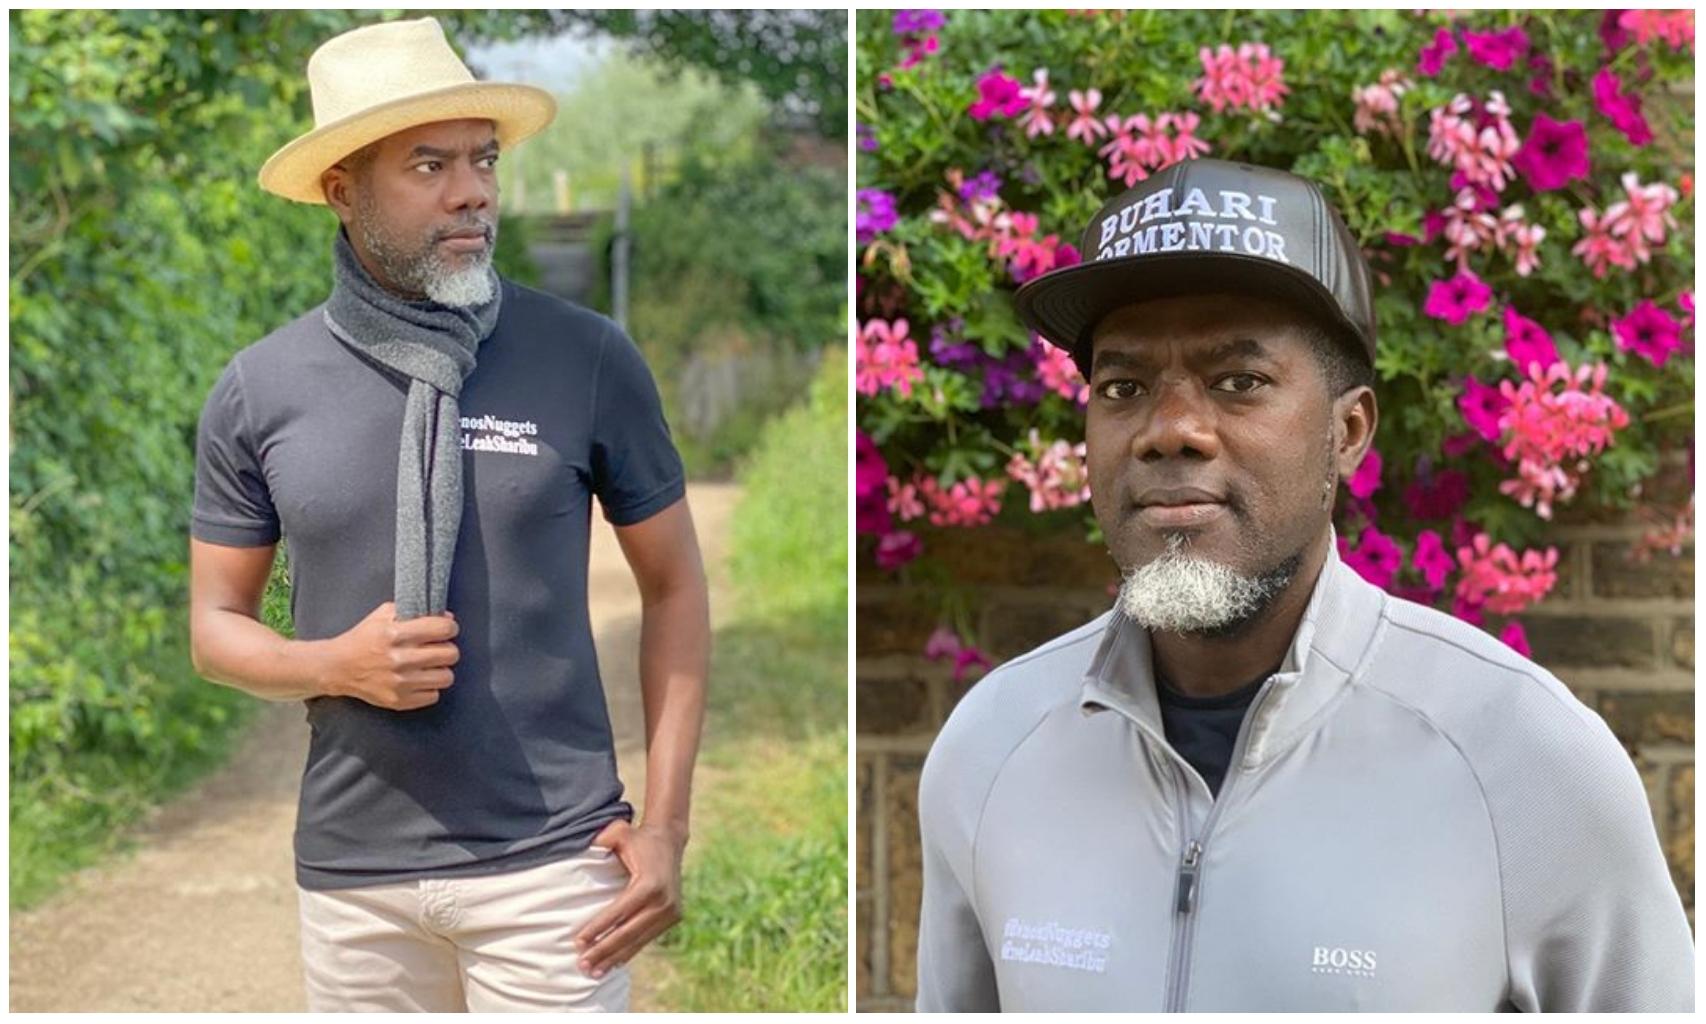 Nollywood has made outsiders seen Nigerians as fetish people - Reno Omokri